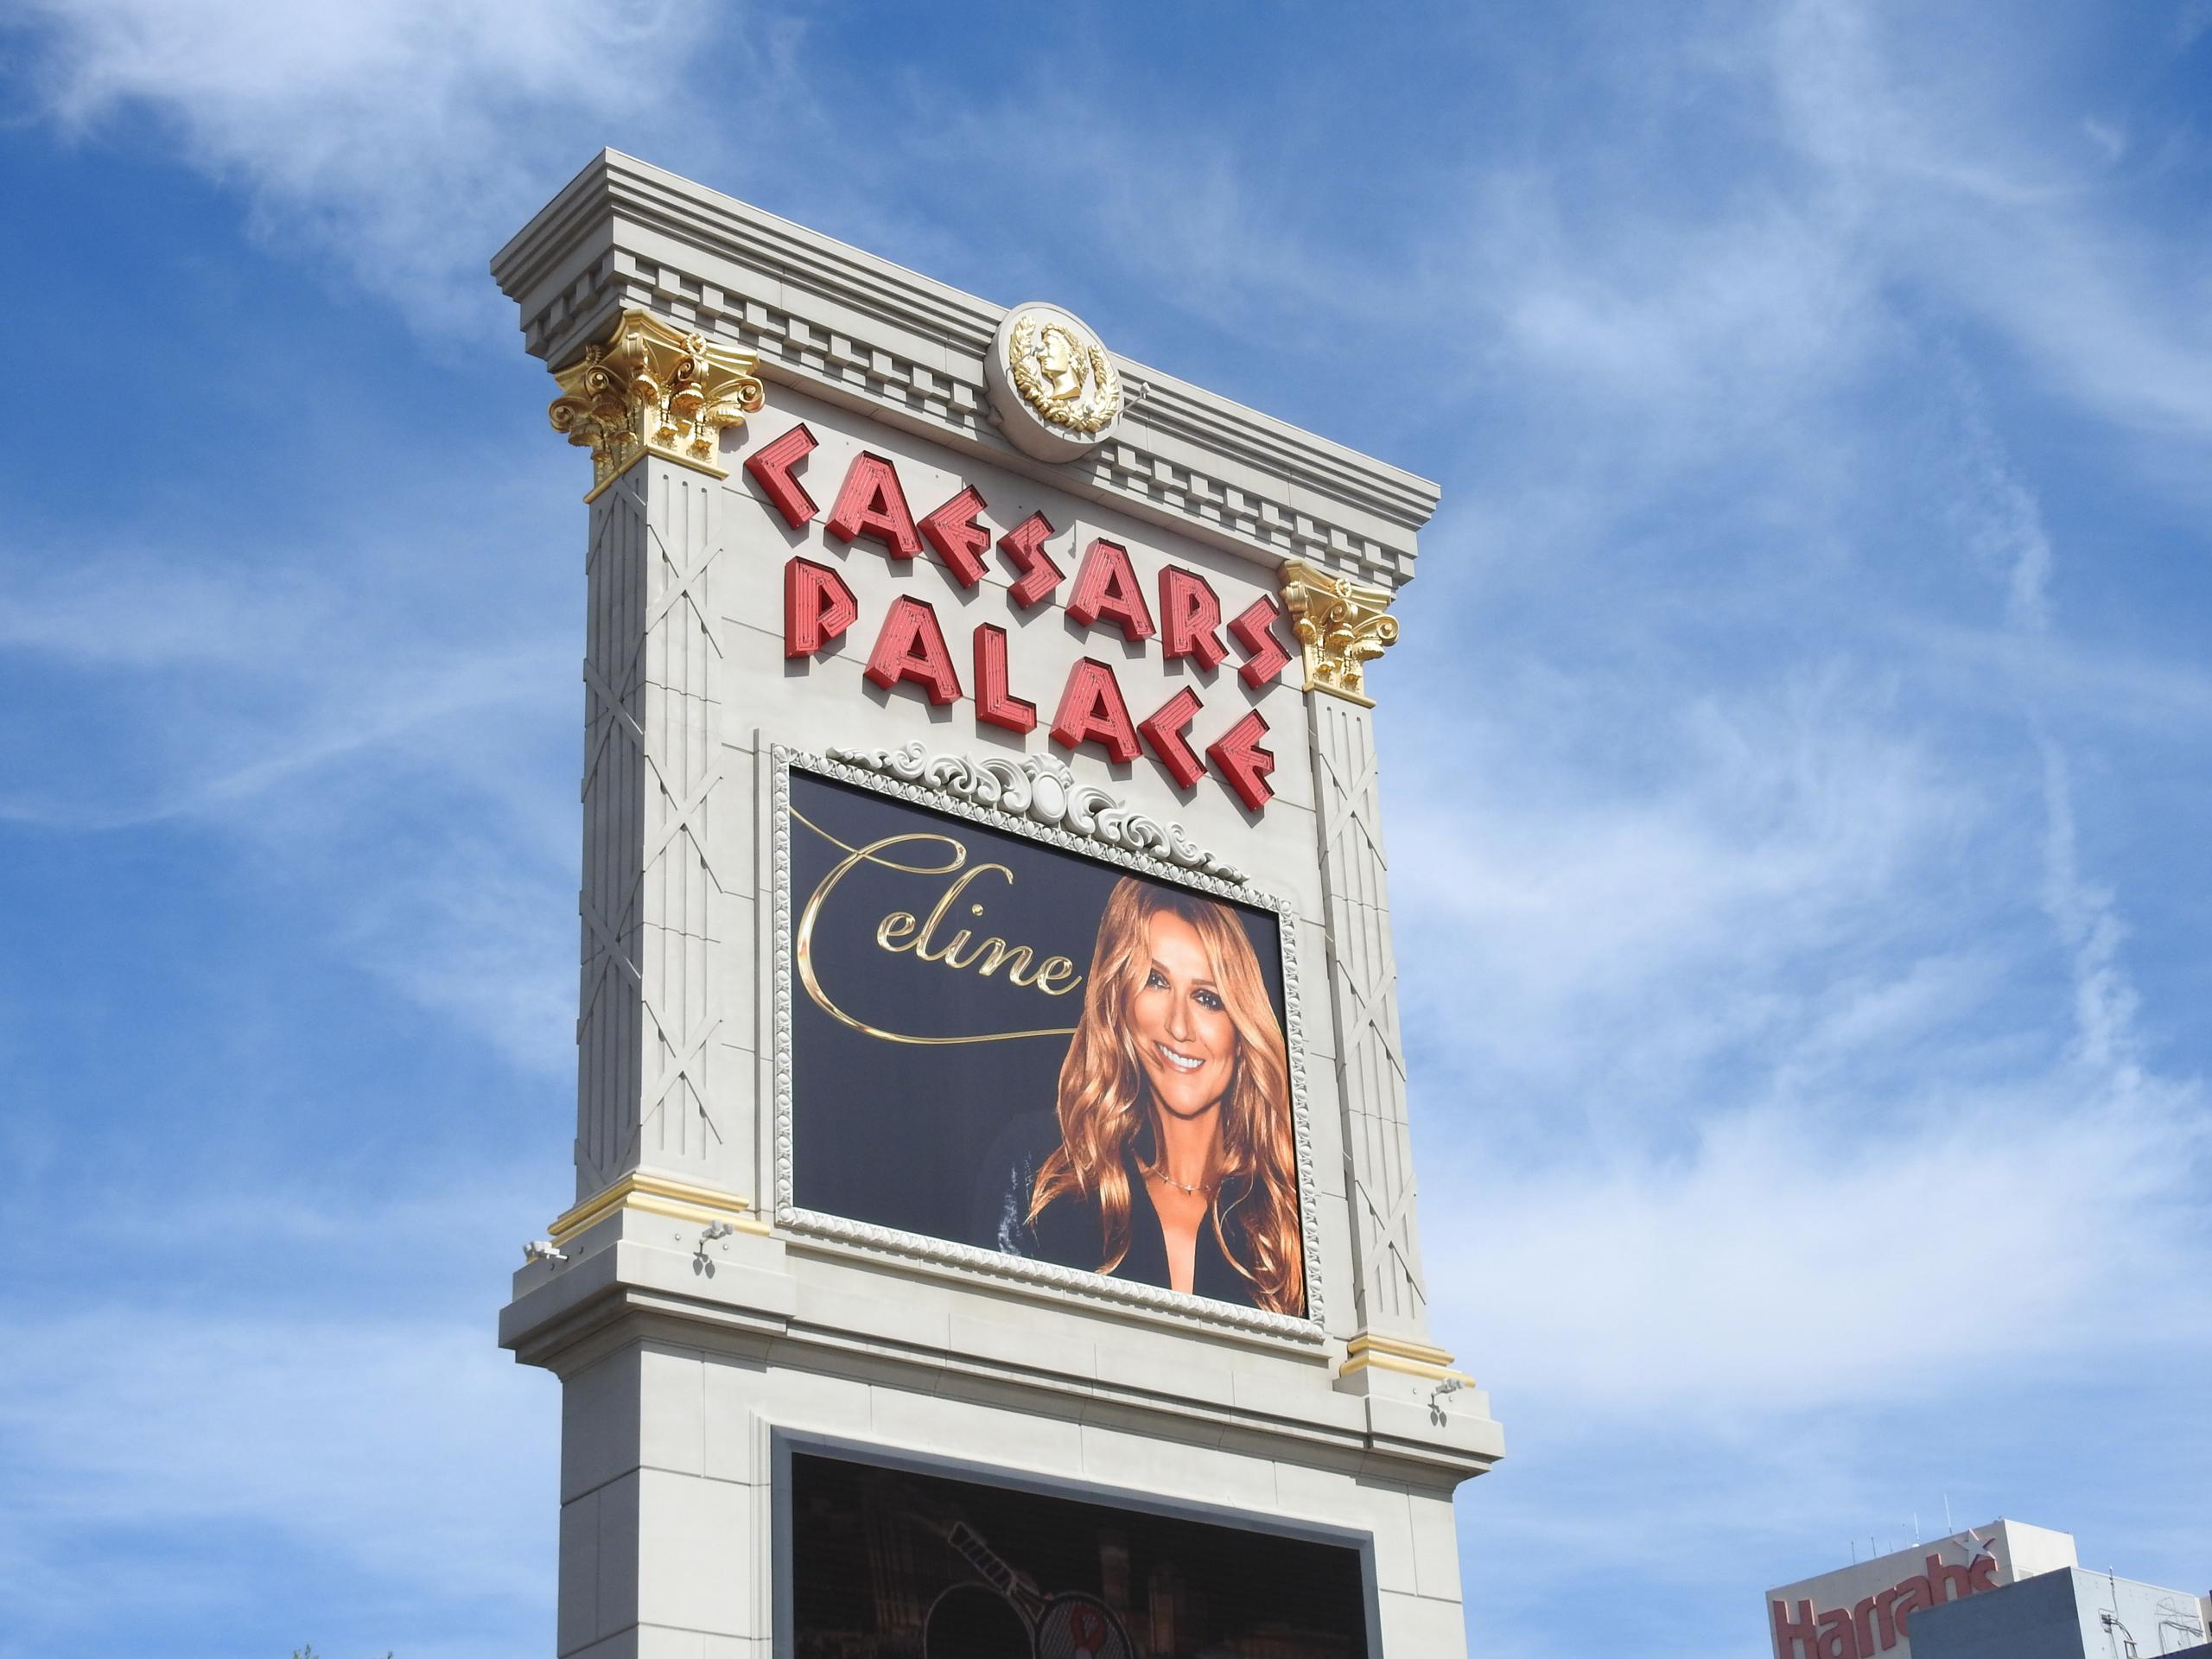 Entrance to Caesars Palace in Las Vegas, Nevada.